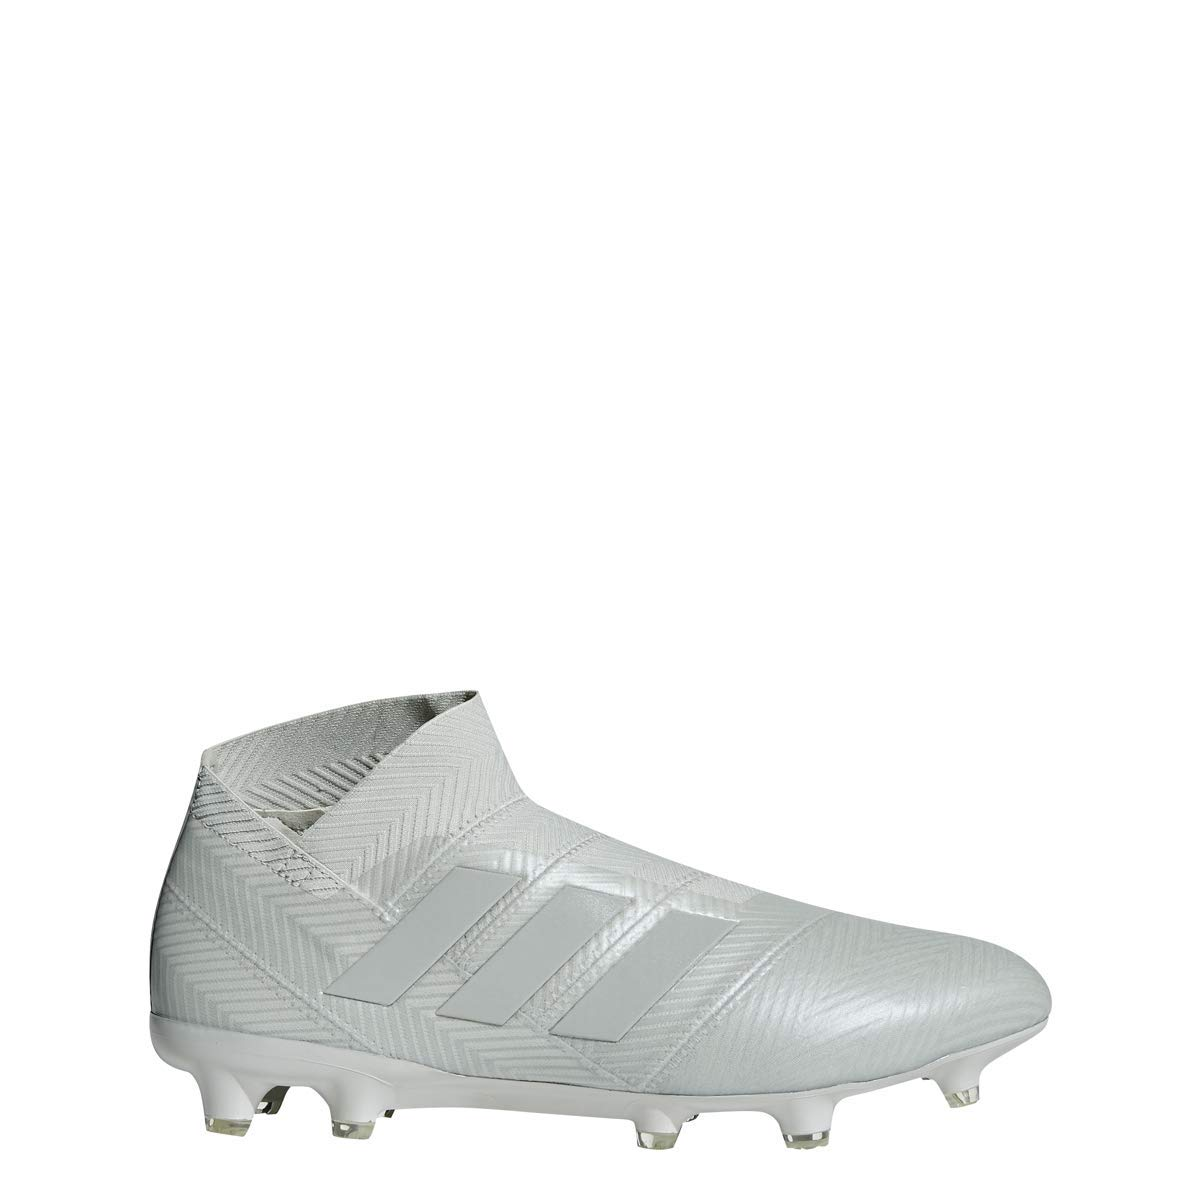 White adidas Nemeziz 18+ FG Cleat Men's Soccer